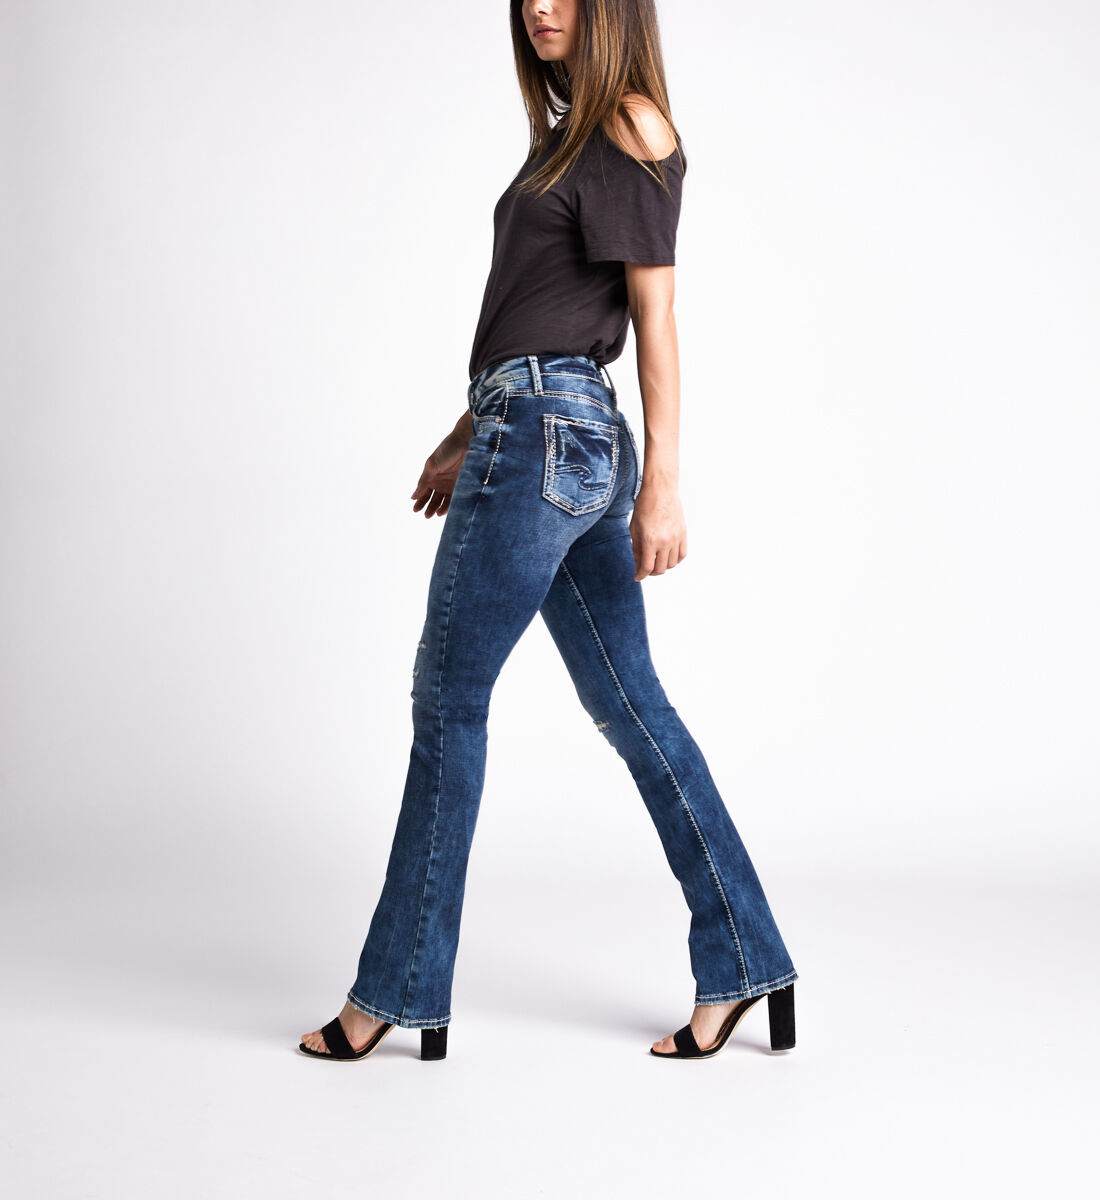 Avery High Rise Slim Bootcut Jeans,Indigo Side